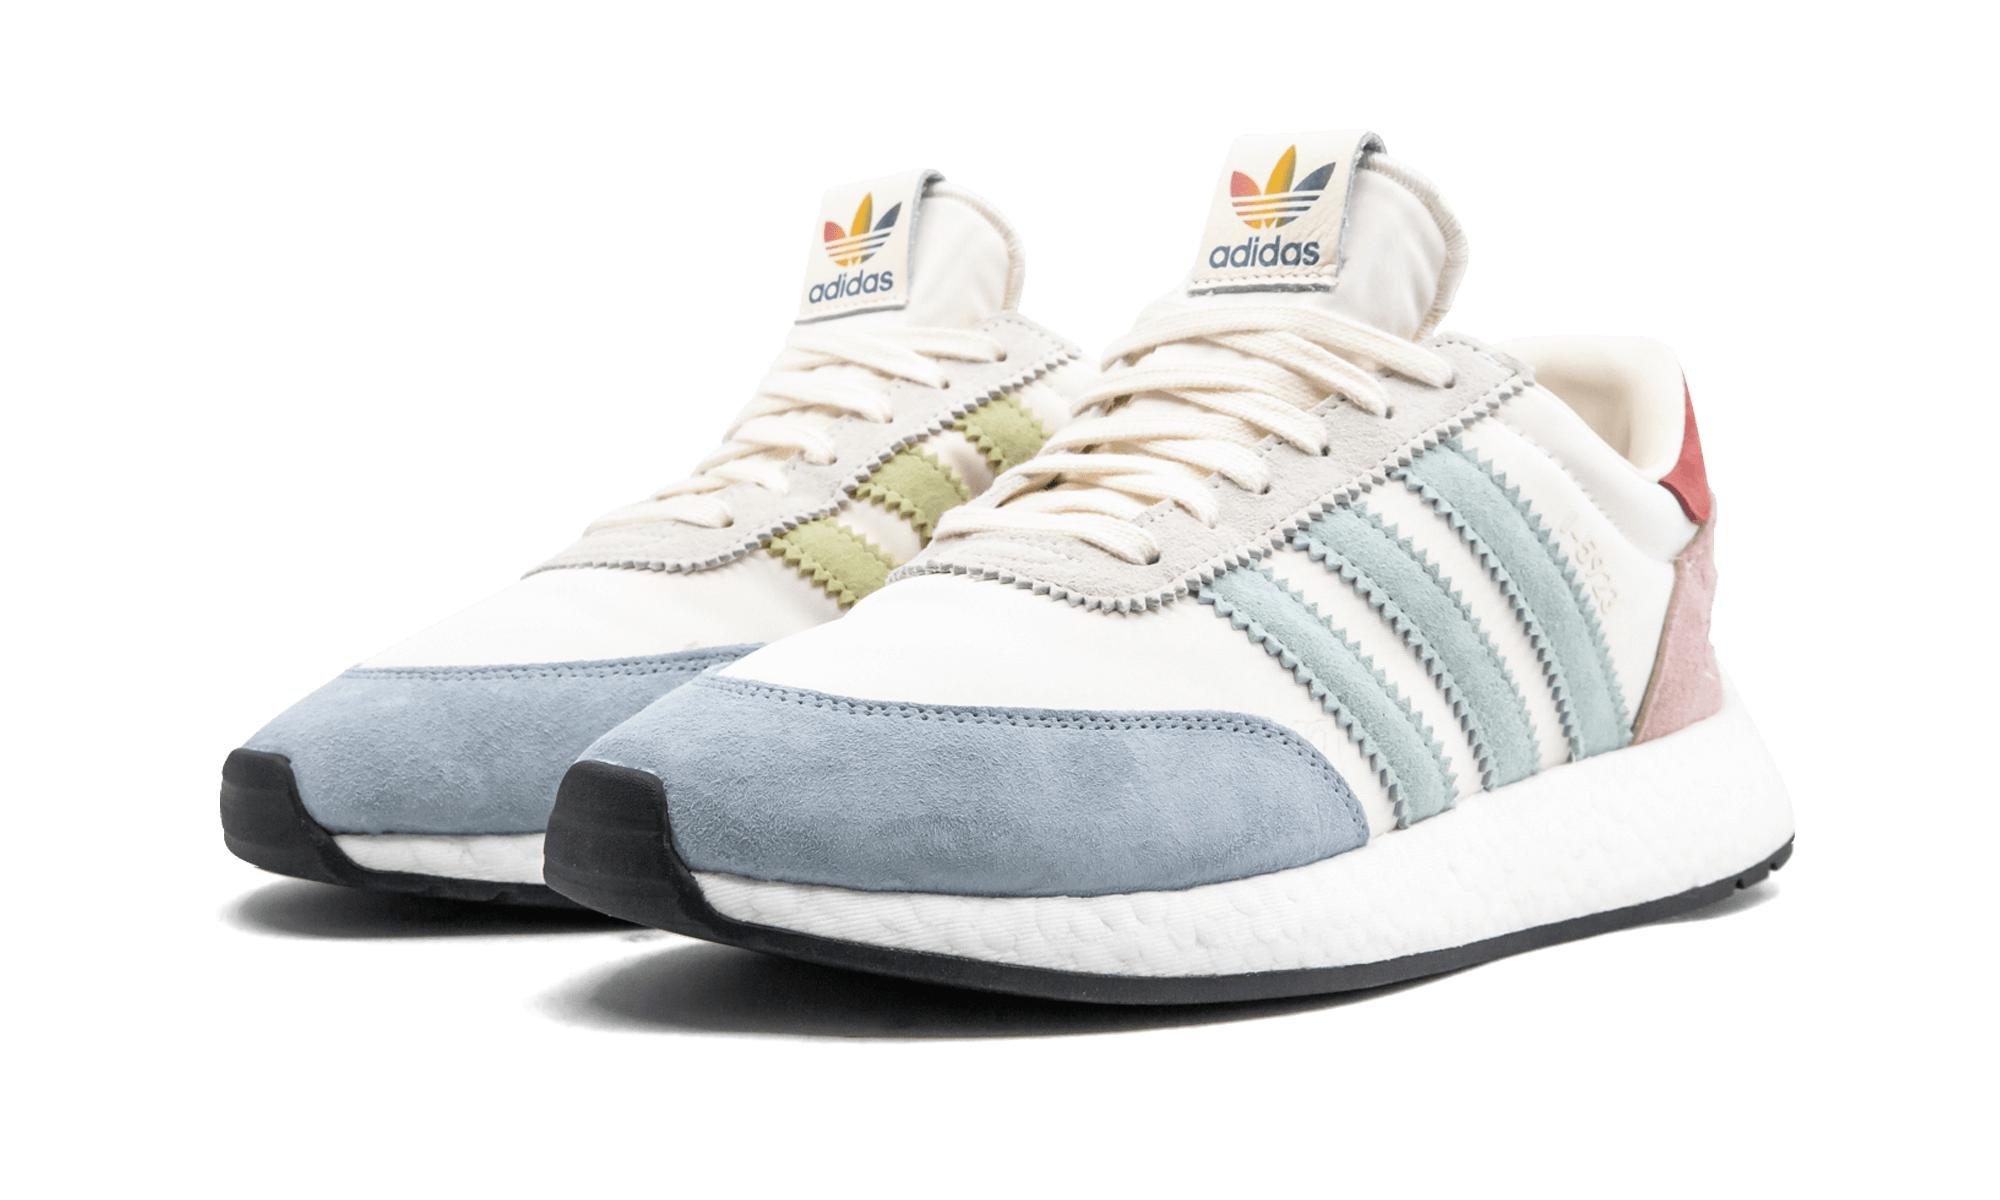 online retailer 97804 7bb77 Adidas - Multicolor I-5923 Pride for Men - Lyst. View fullscreen